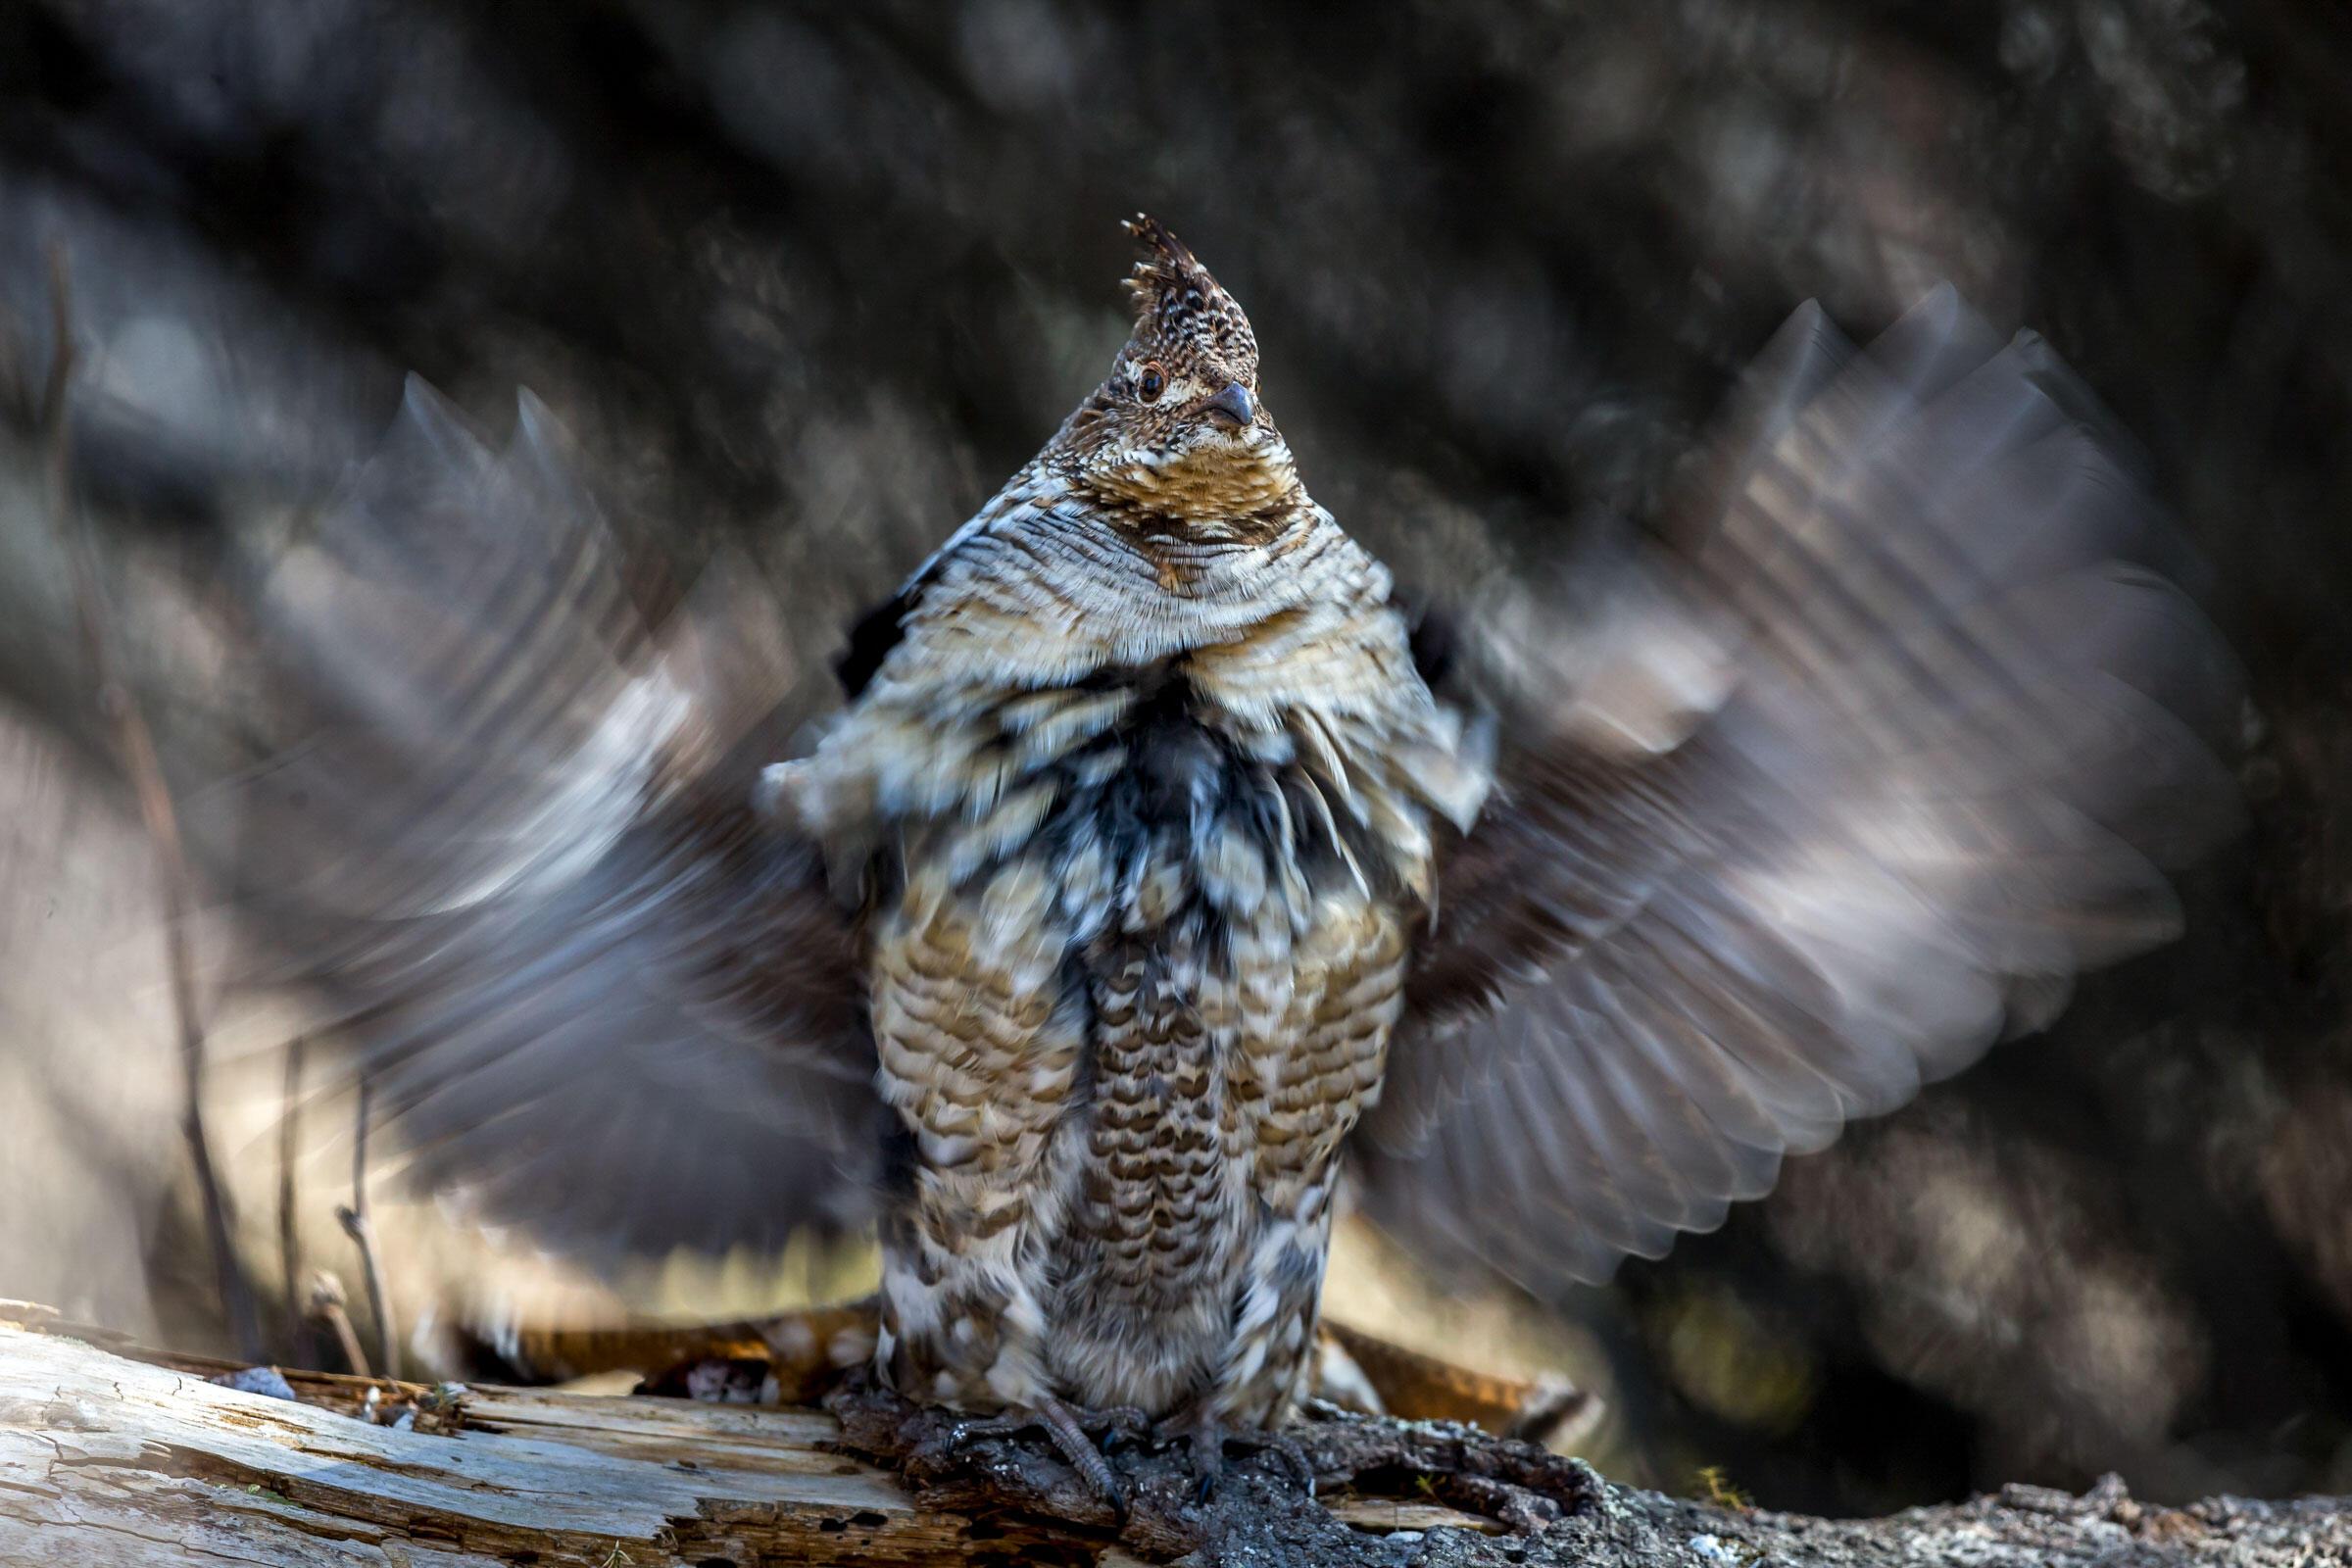 Ruffed Grouse. Brent Cizek/Audubon Photography Awards